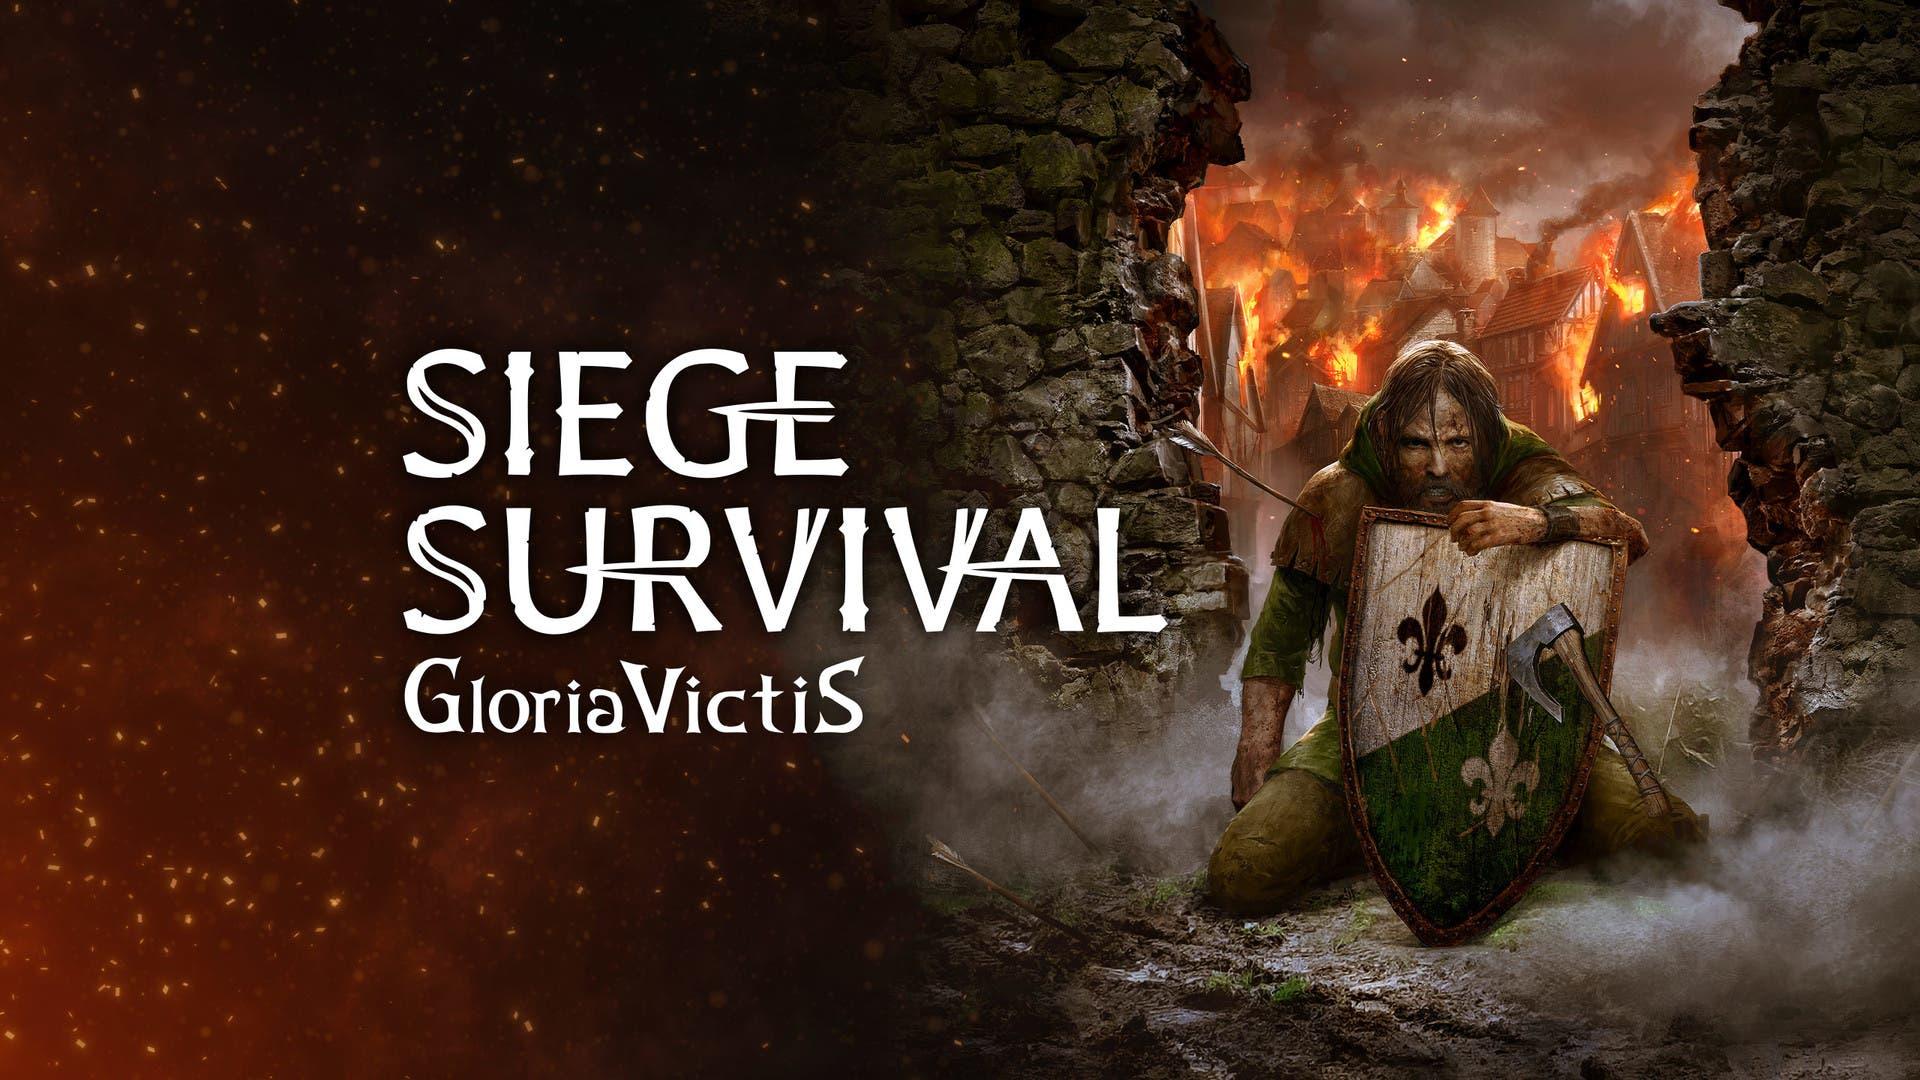 SiegeSurvival GloriaVictis review featured